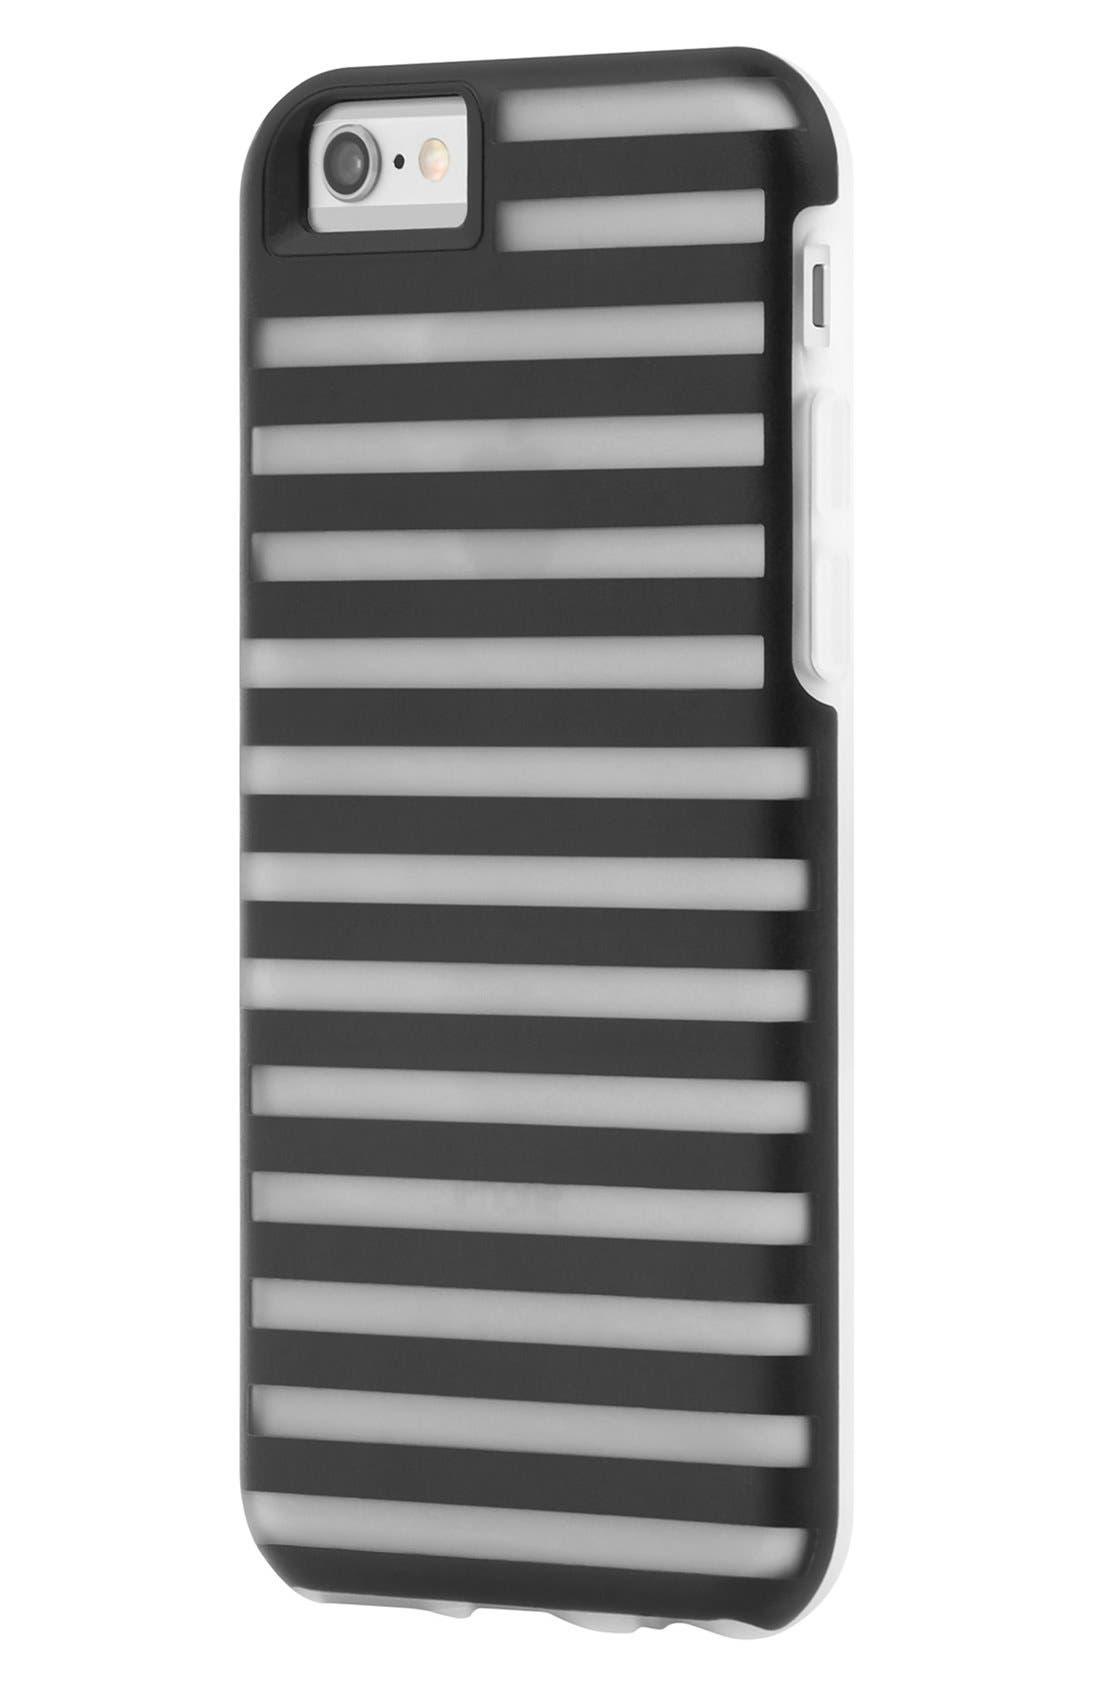 TAVIK Hollow iPhone 6/6s Case